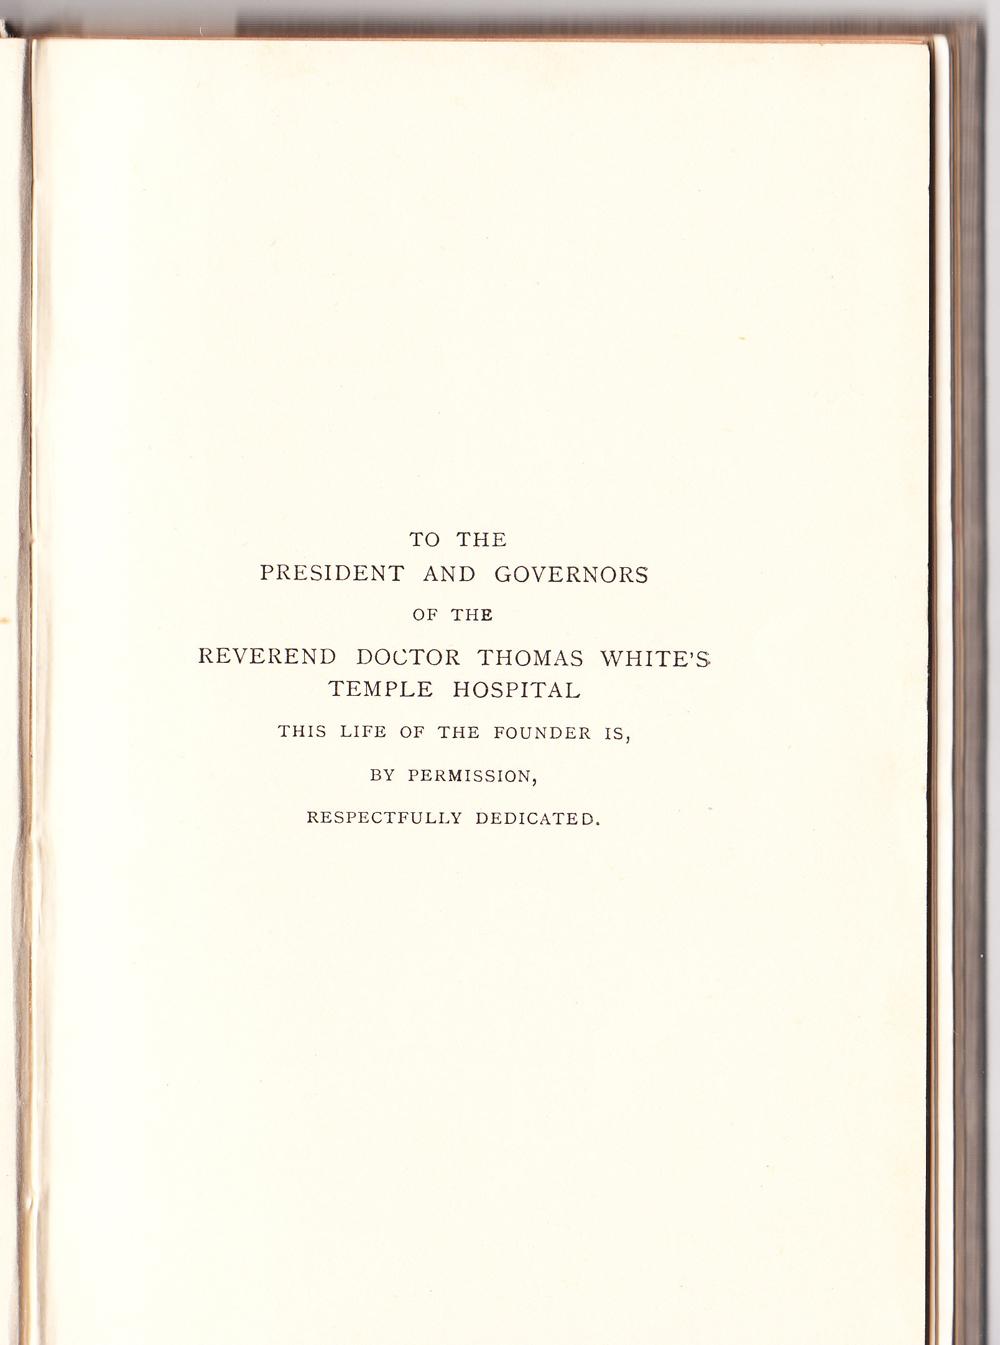 © drwhitesbristol.co.uk - book preface